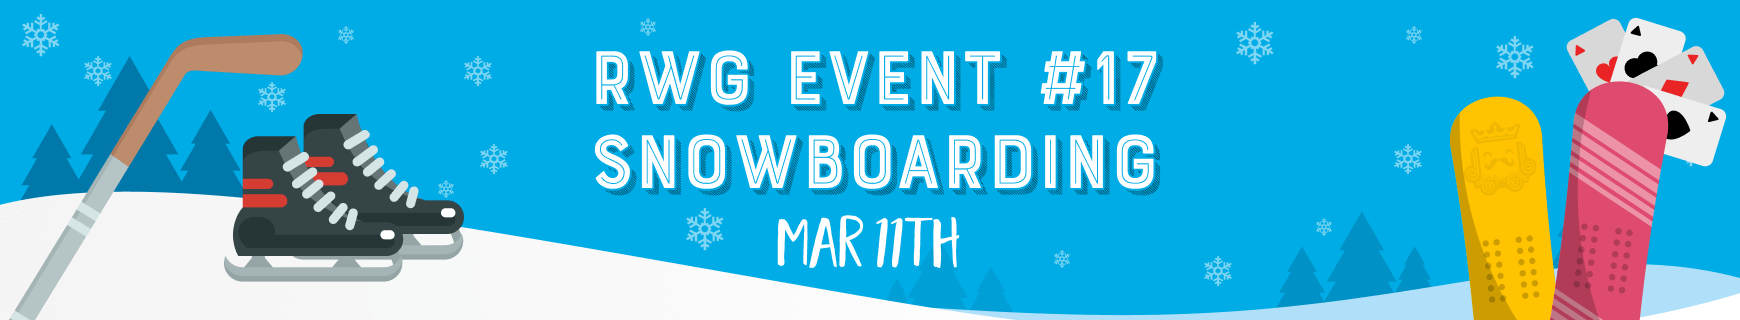 Replay winter games   17   snowboarding   dashboard %28870 x 160%29 x2